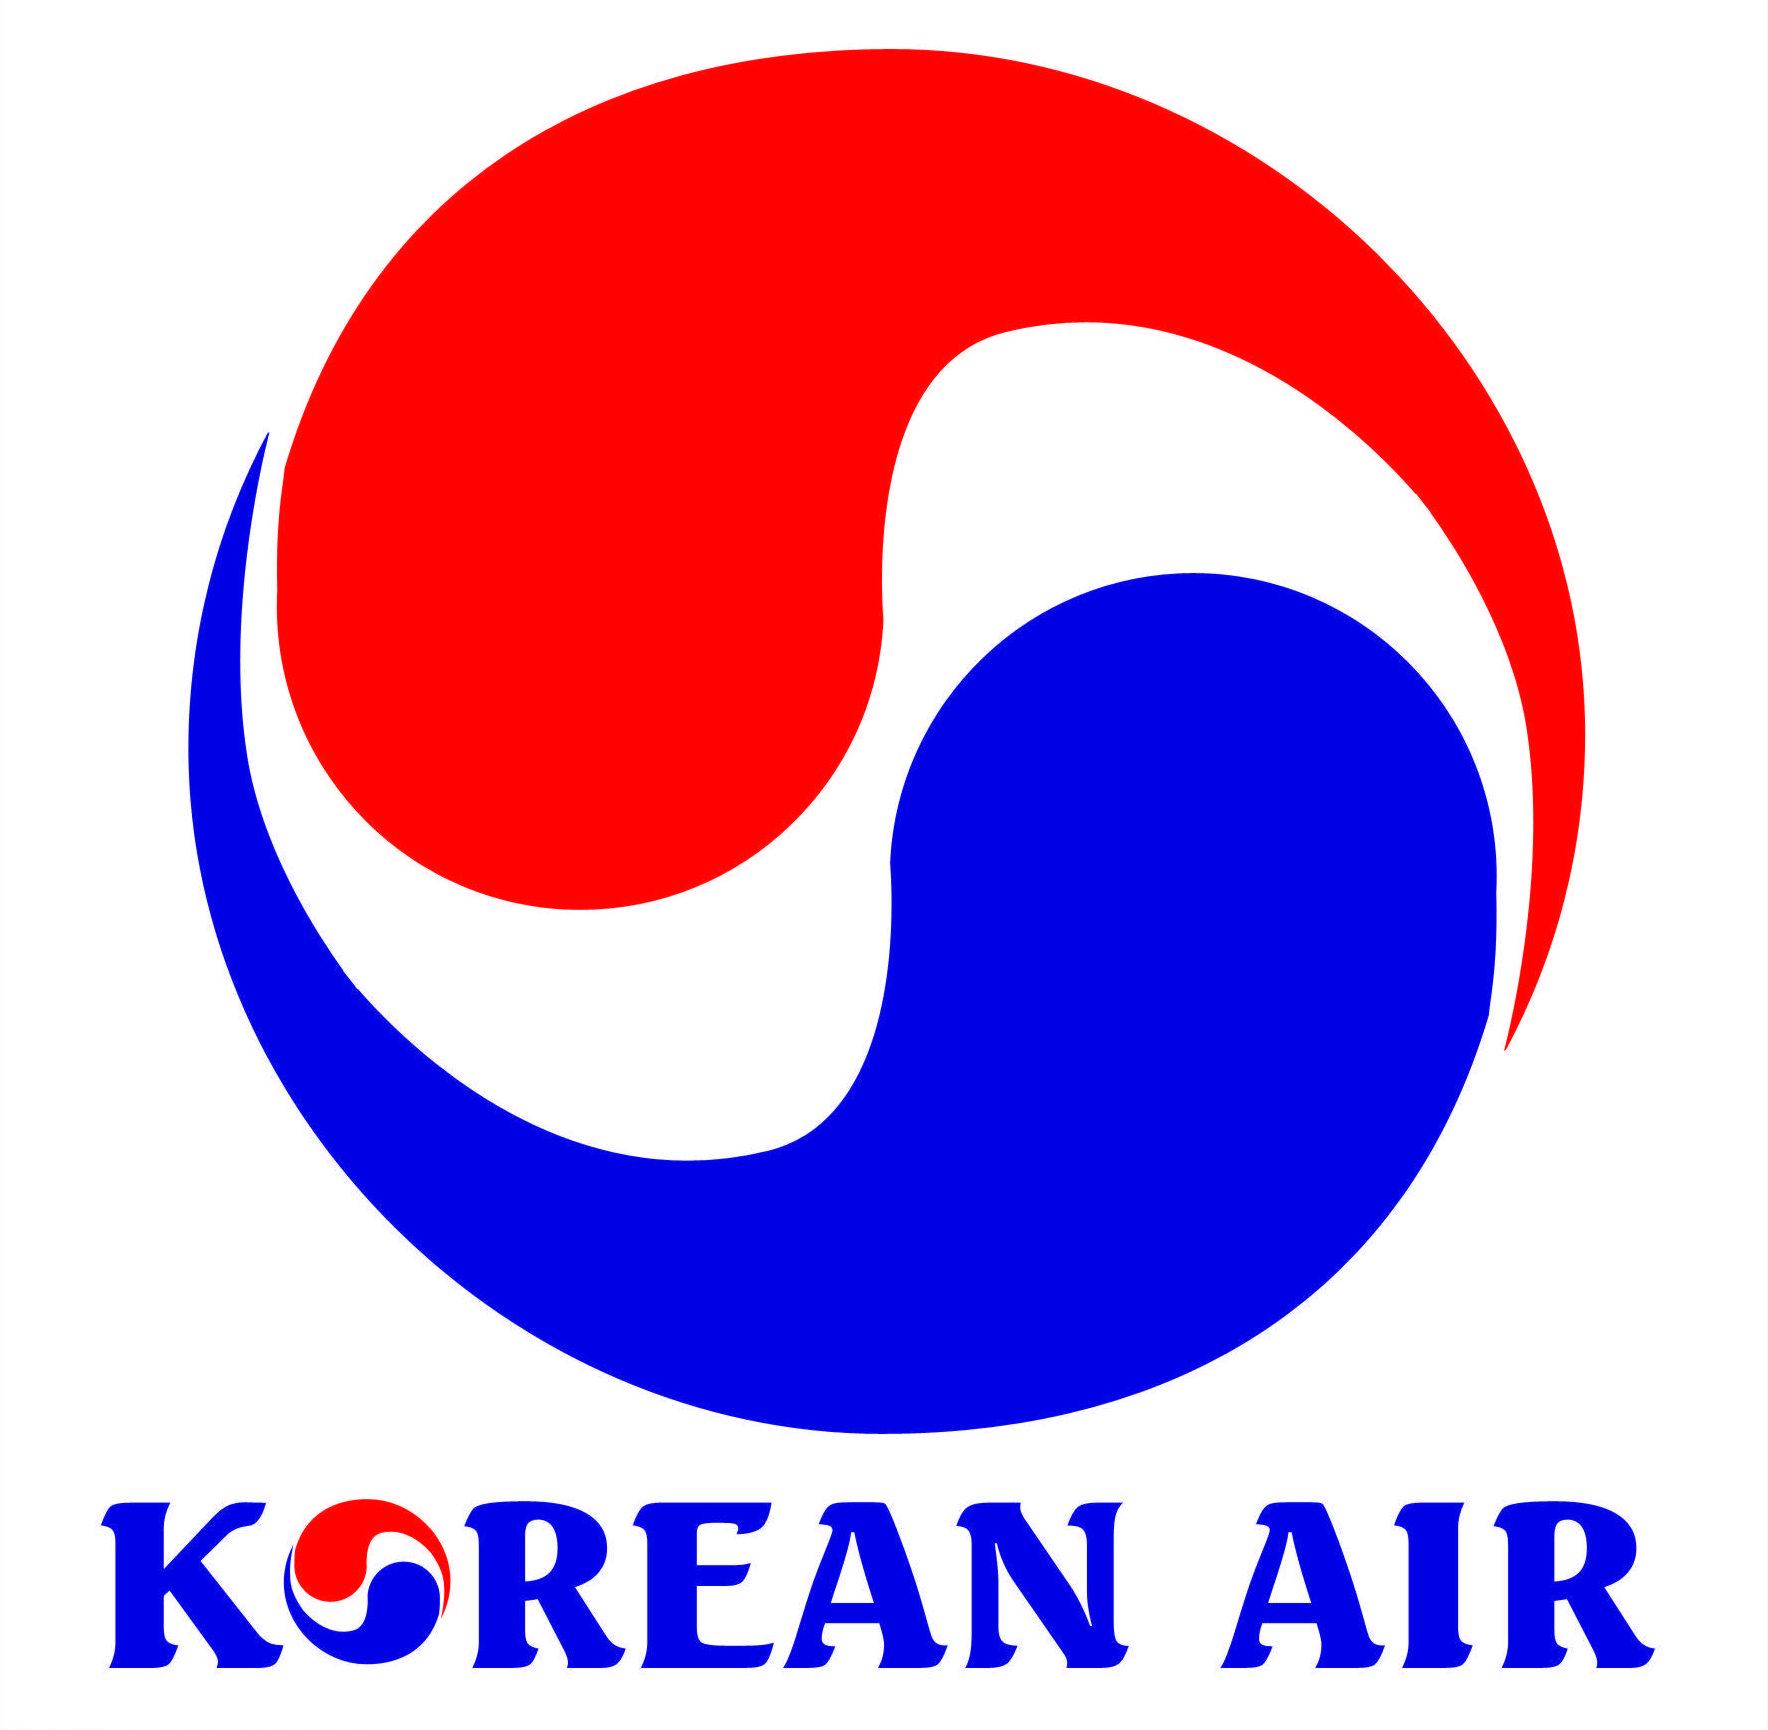 Image result for korean air logo